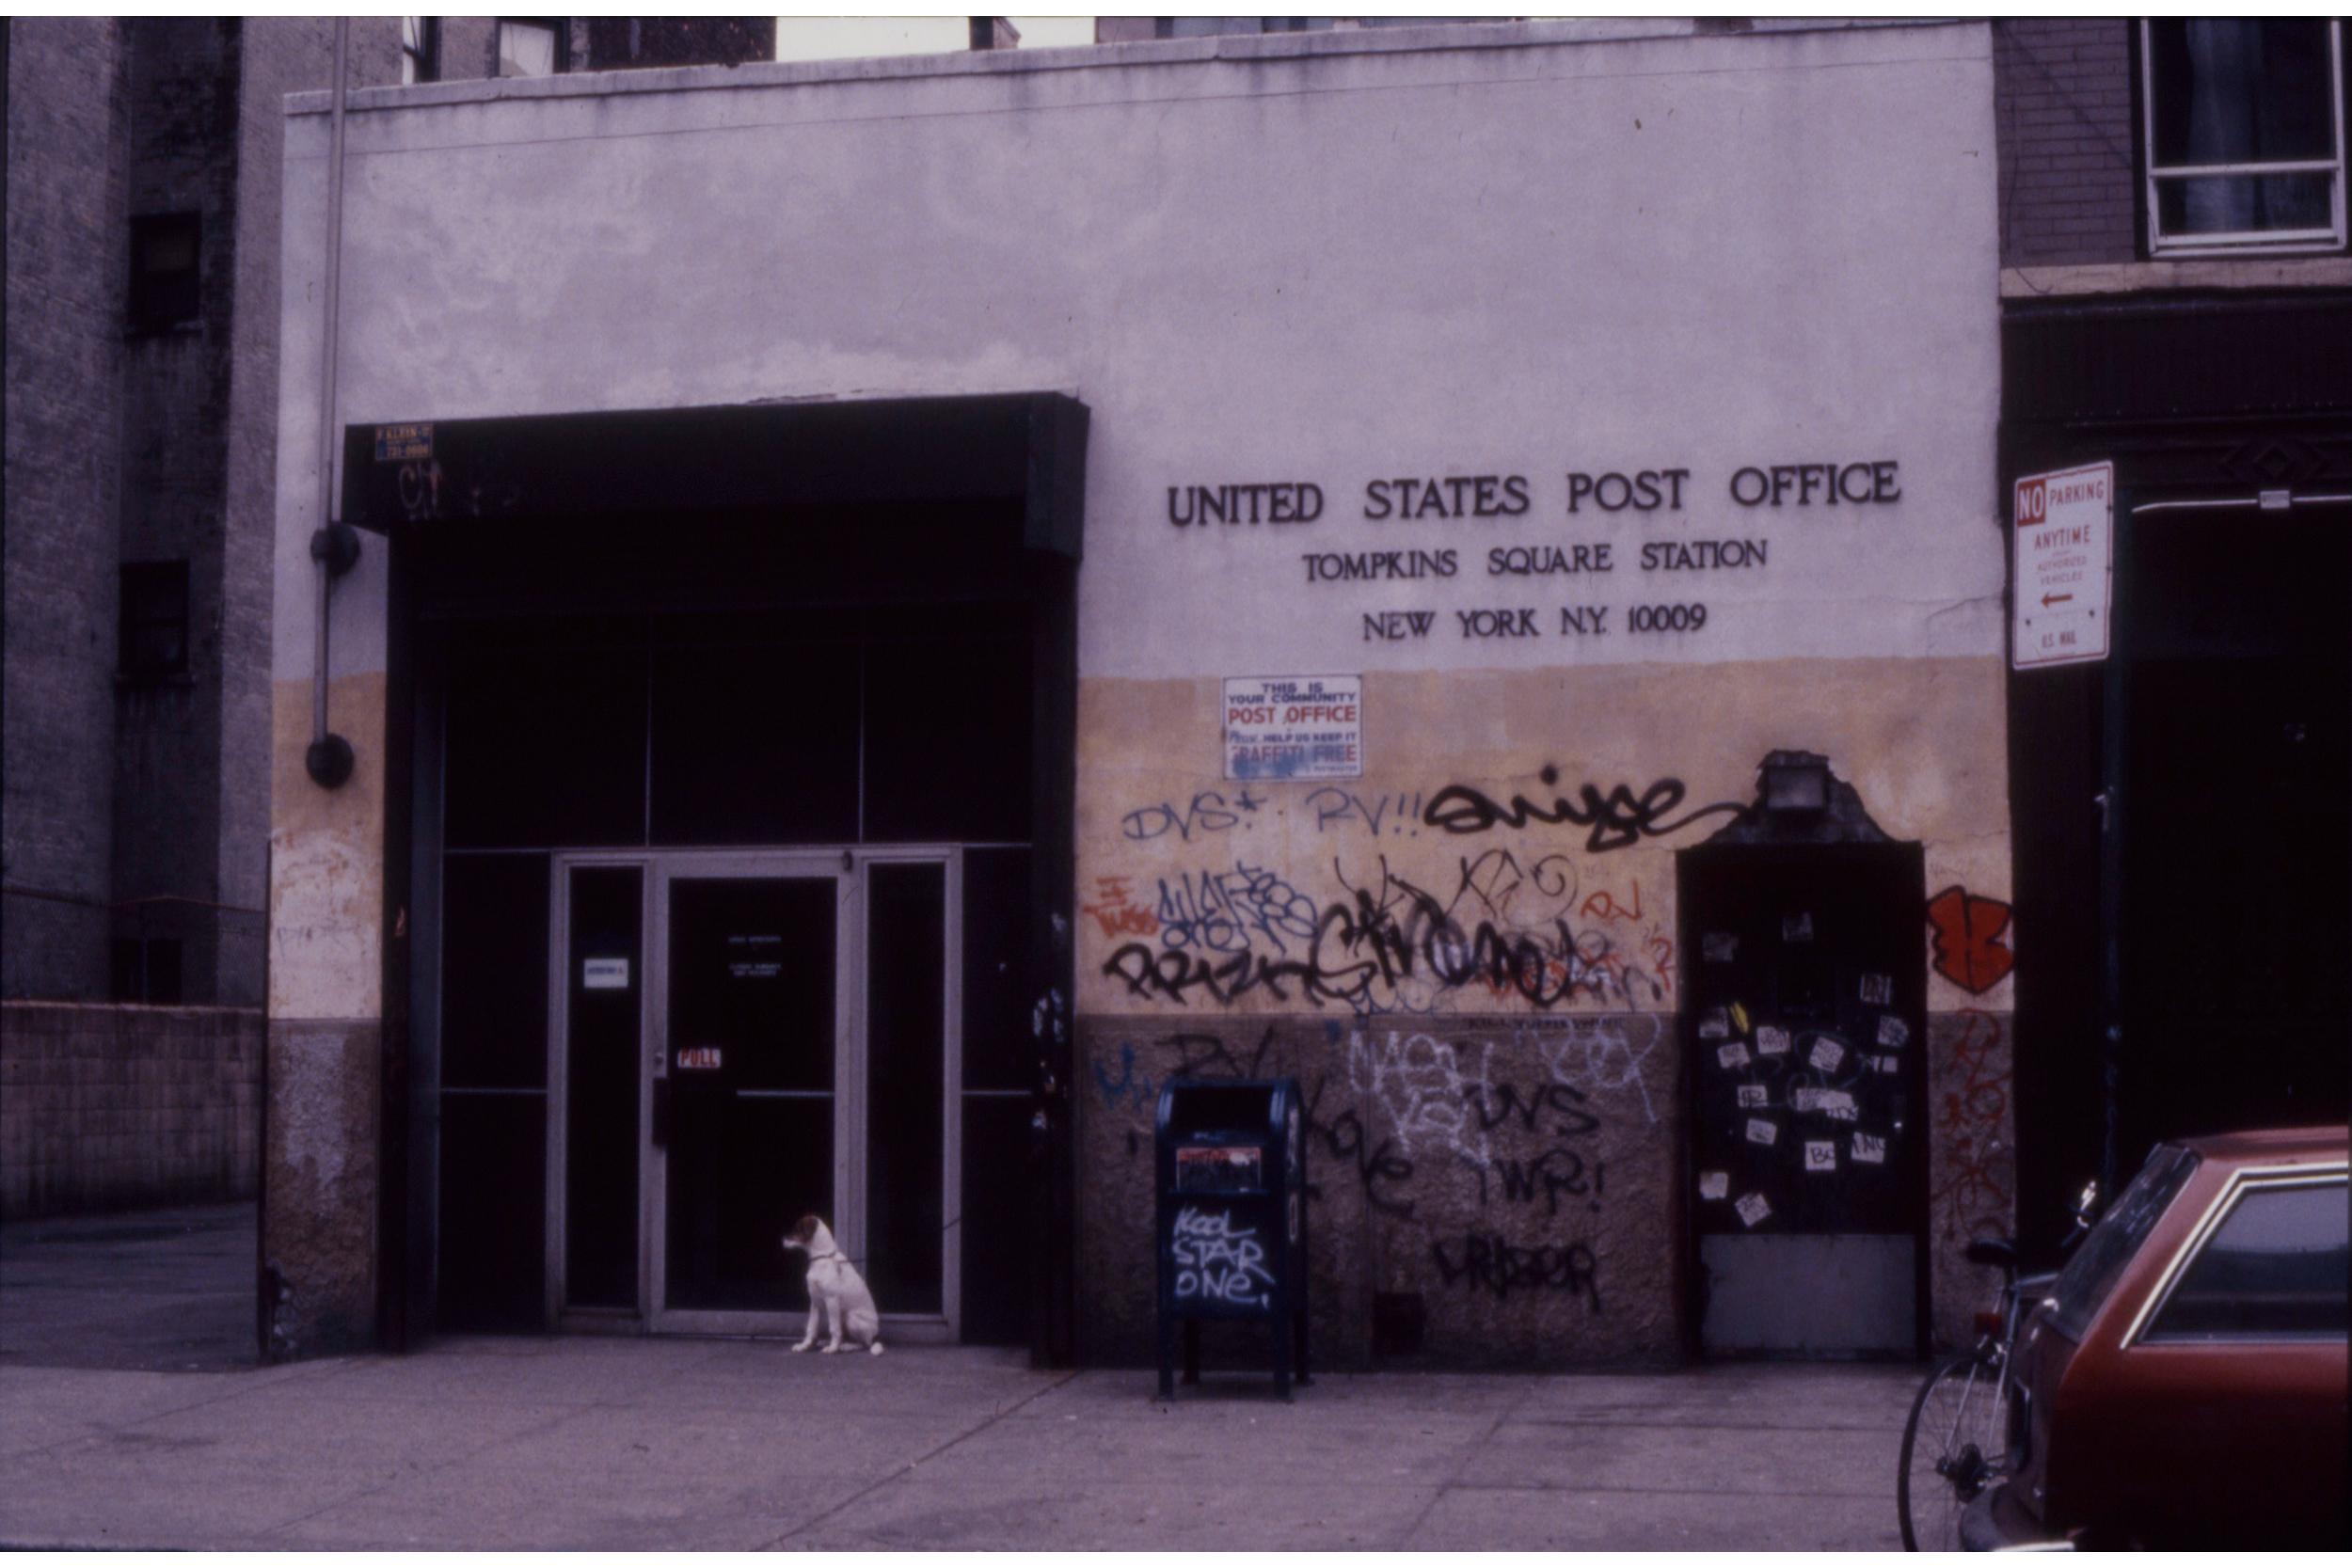 East Village Post Office, c 1989